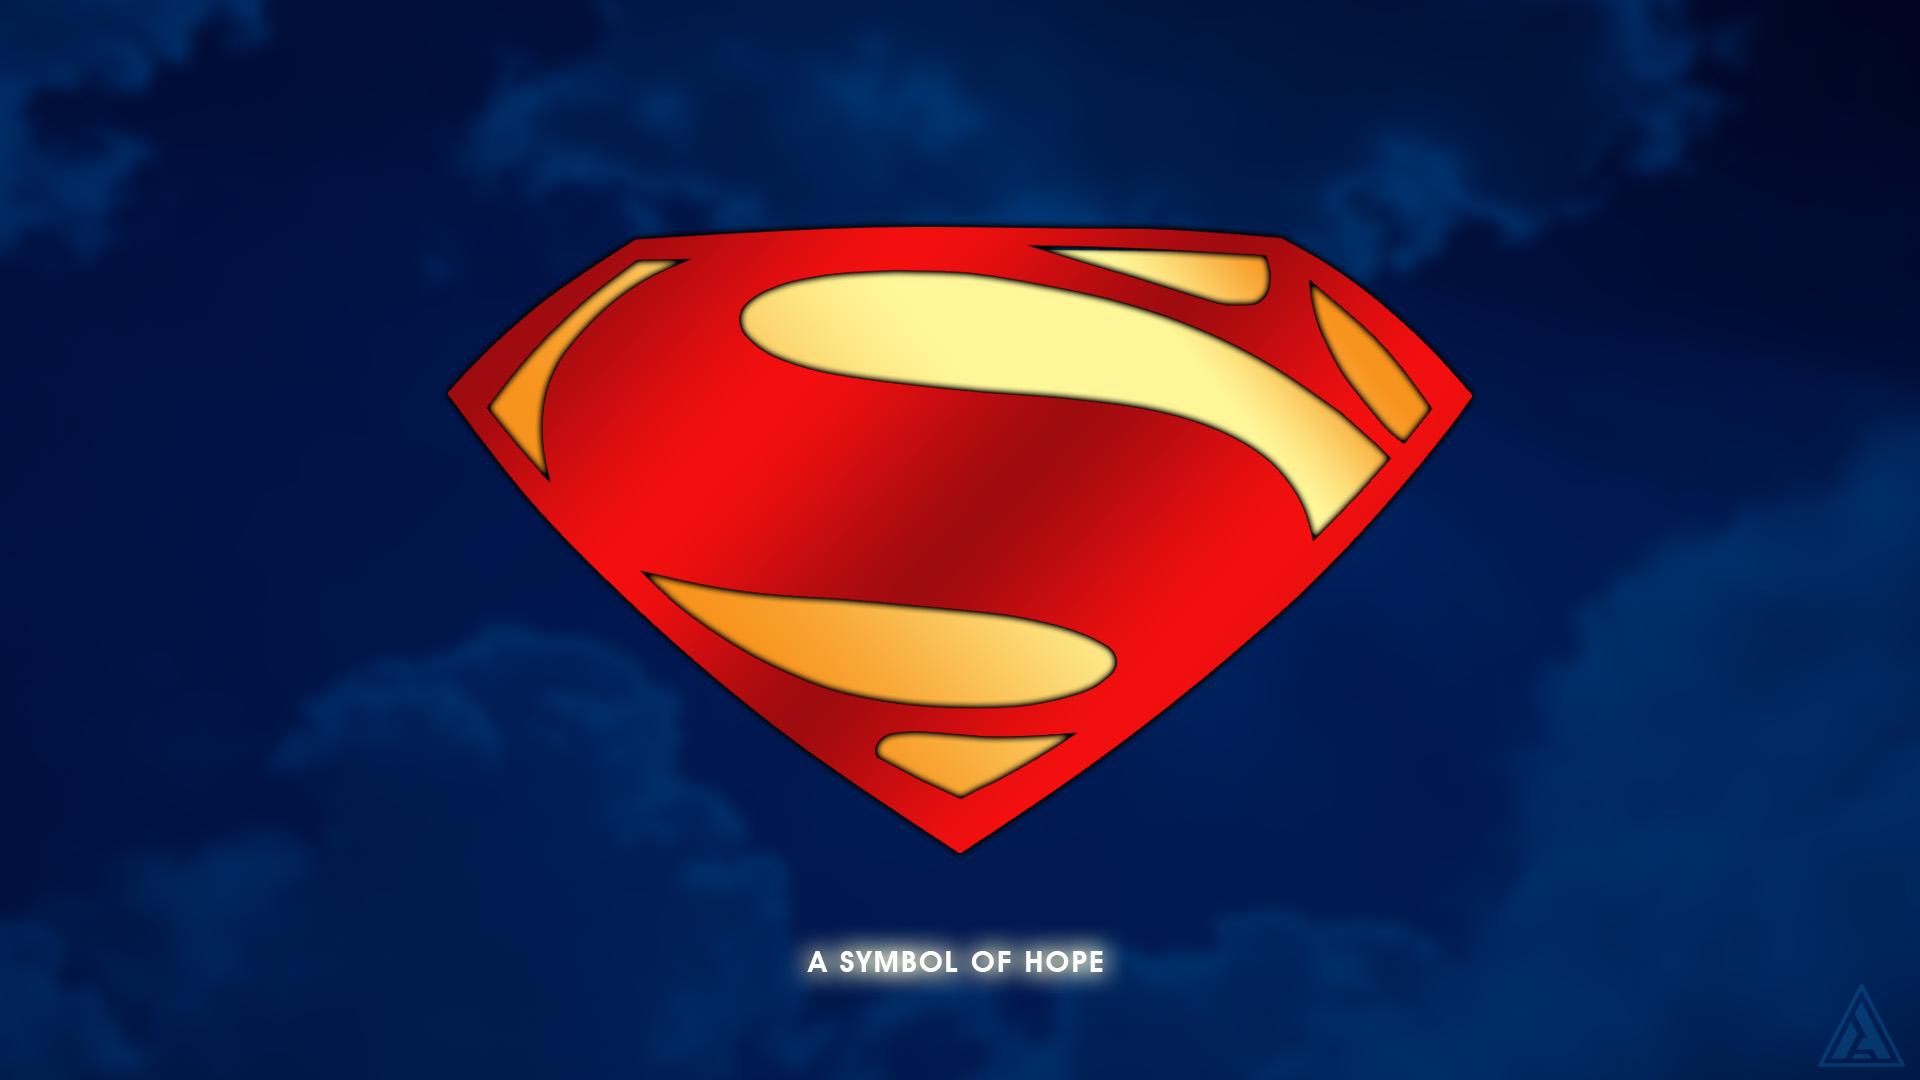 Updated Superman Shieldlogo Wallpaper 1920x1080